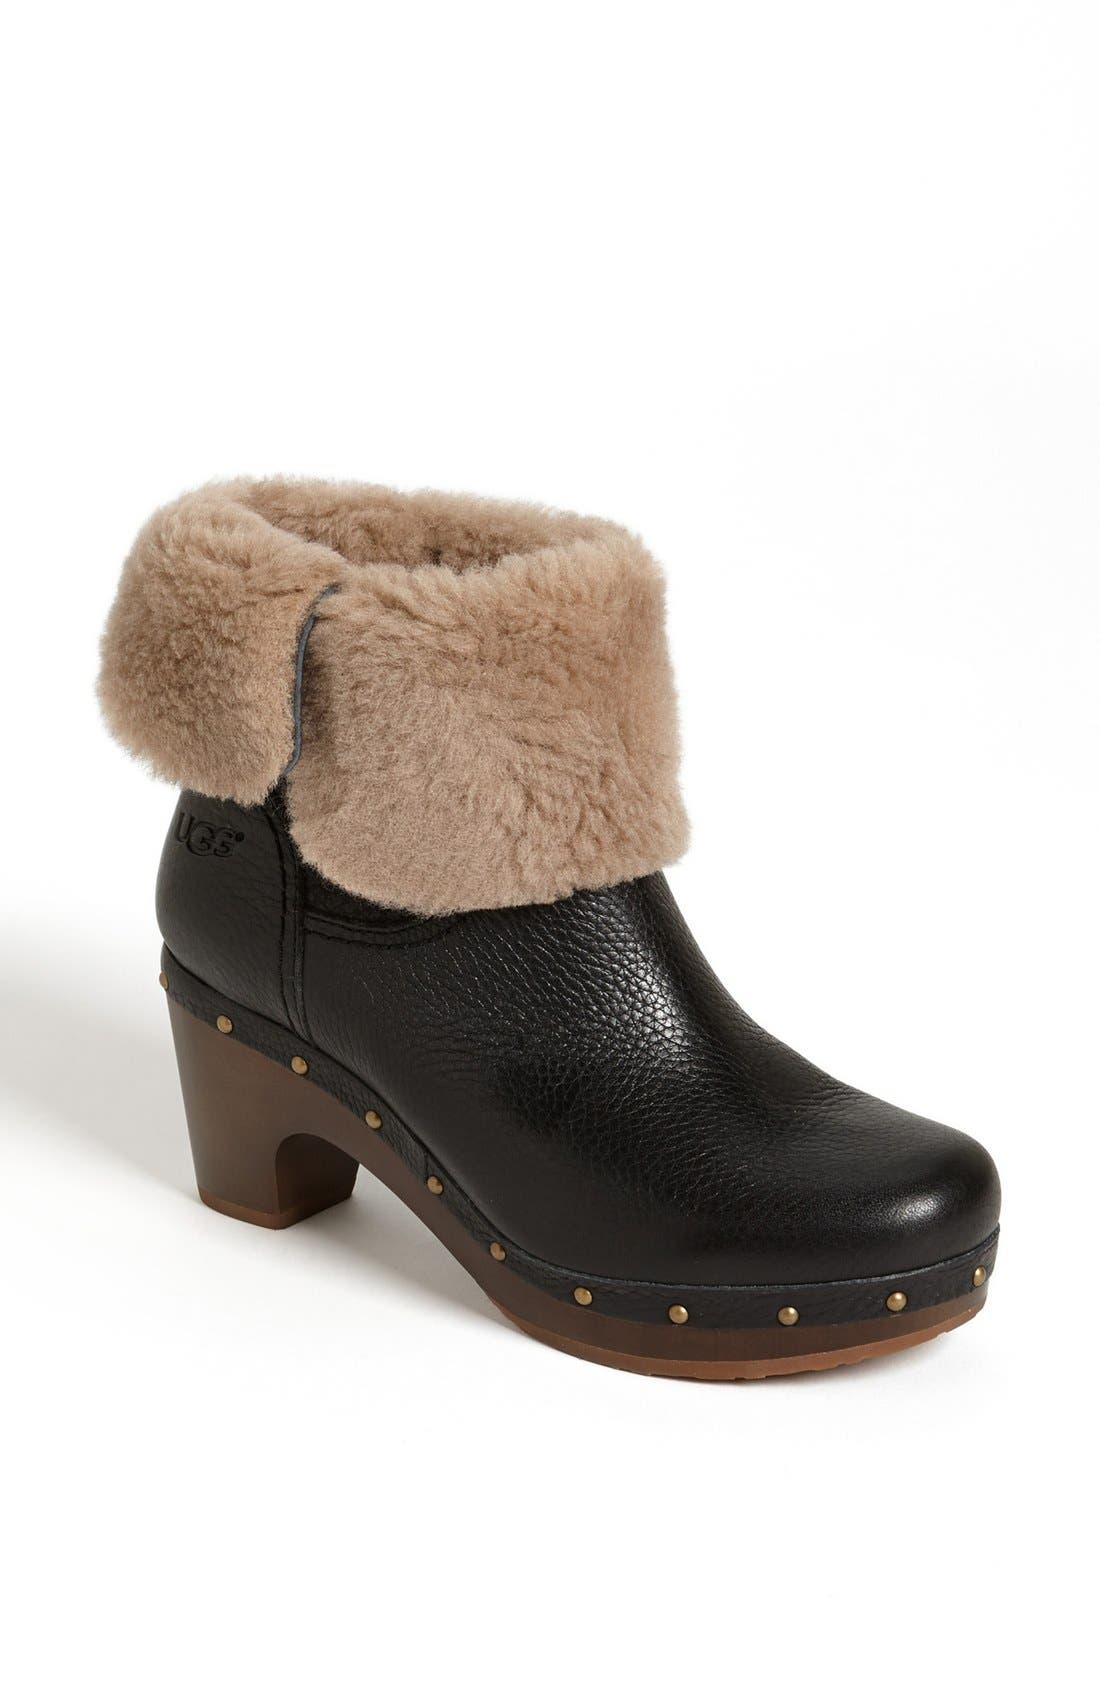 Alternate Image 1 Selected - UGG® Australia 'Amoret' Boot (Women)